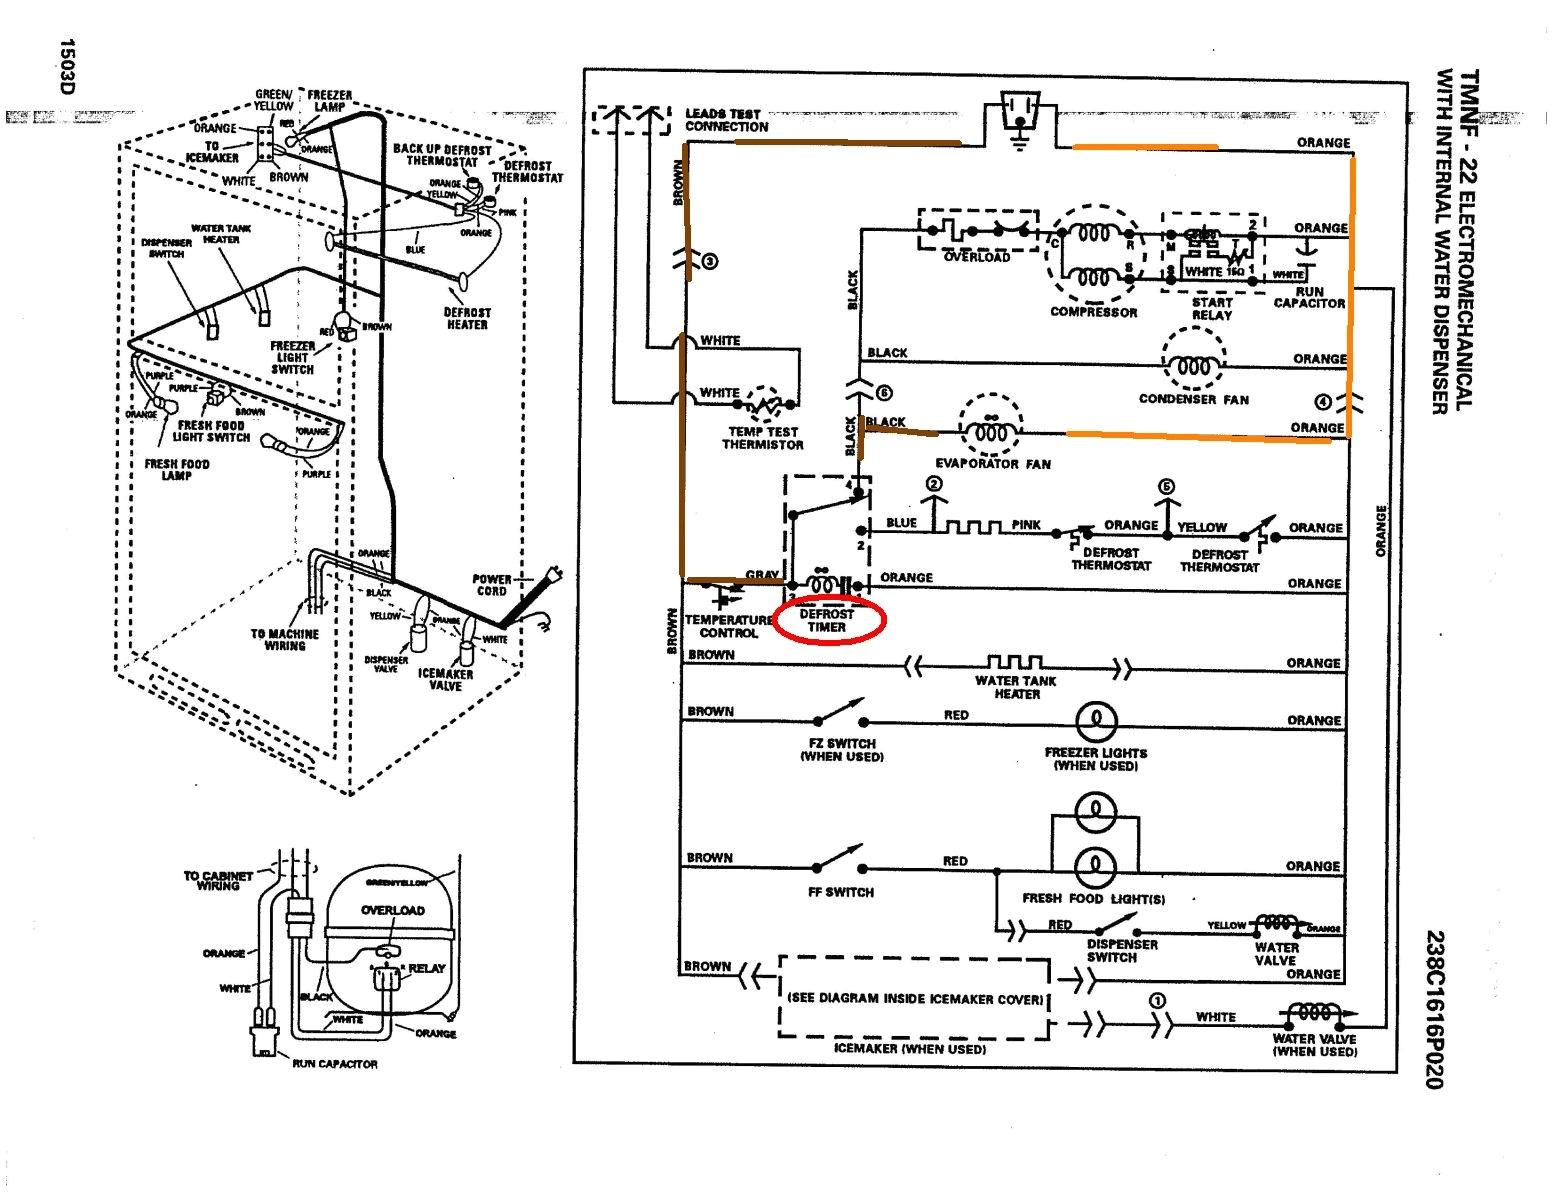 ge profile dryer schematic wiring diagramge dryer wiring schematic wiring diagram database mix hotpoint dryer timer